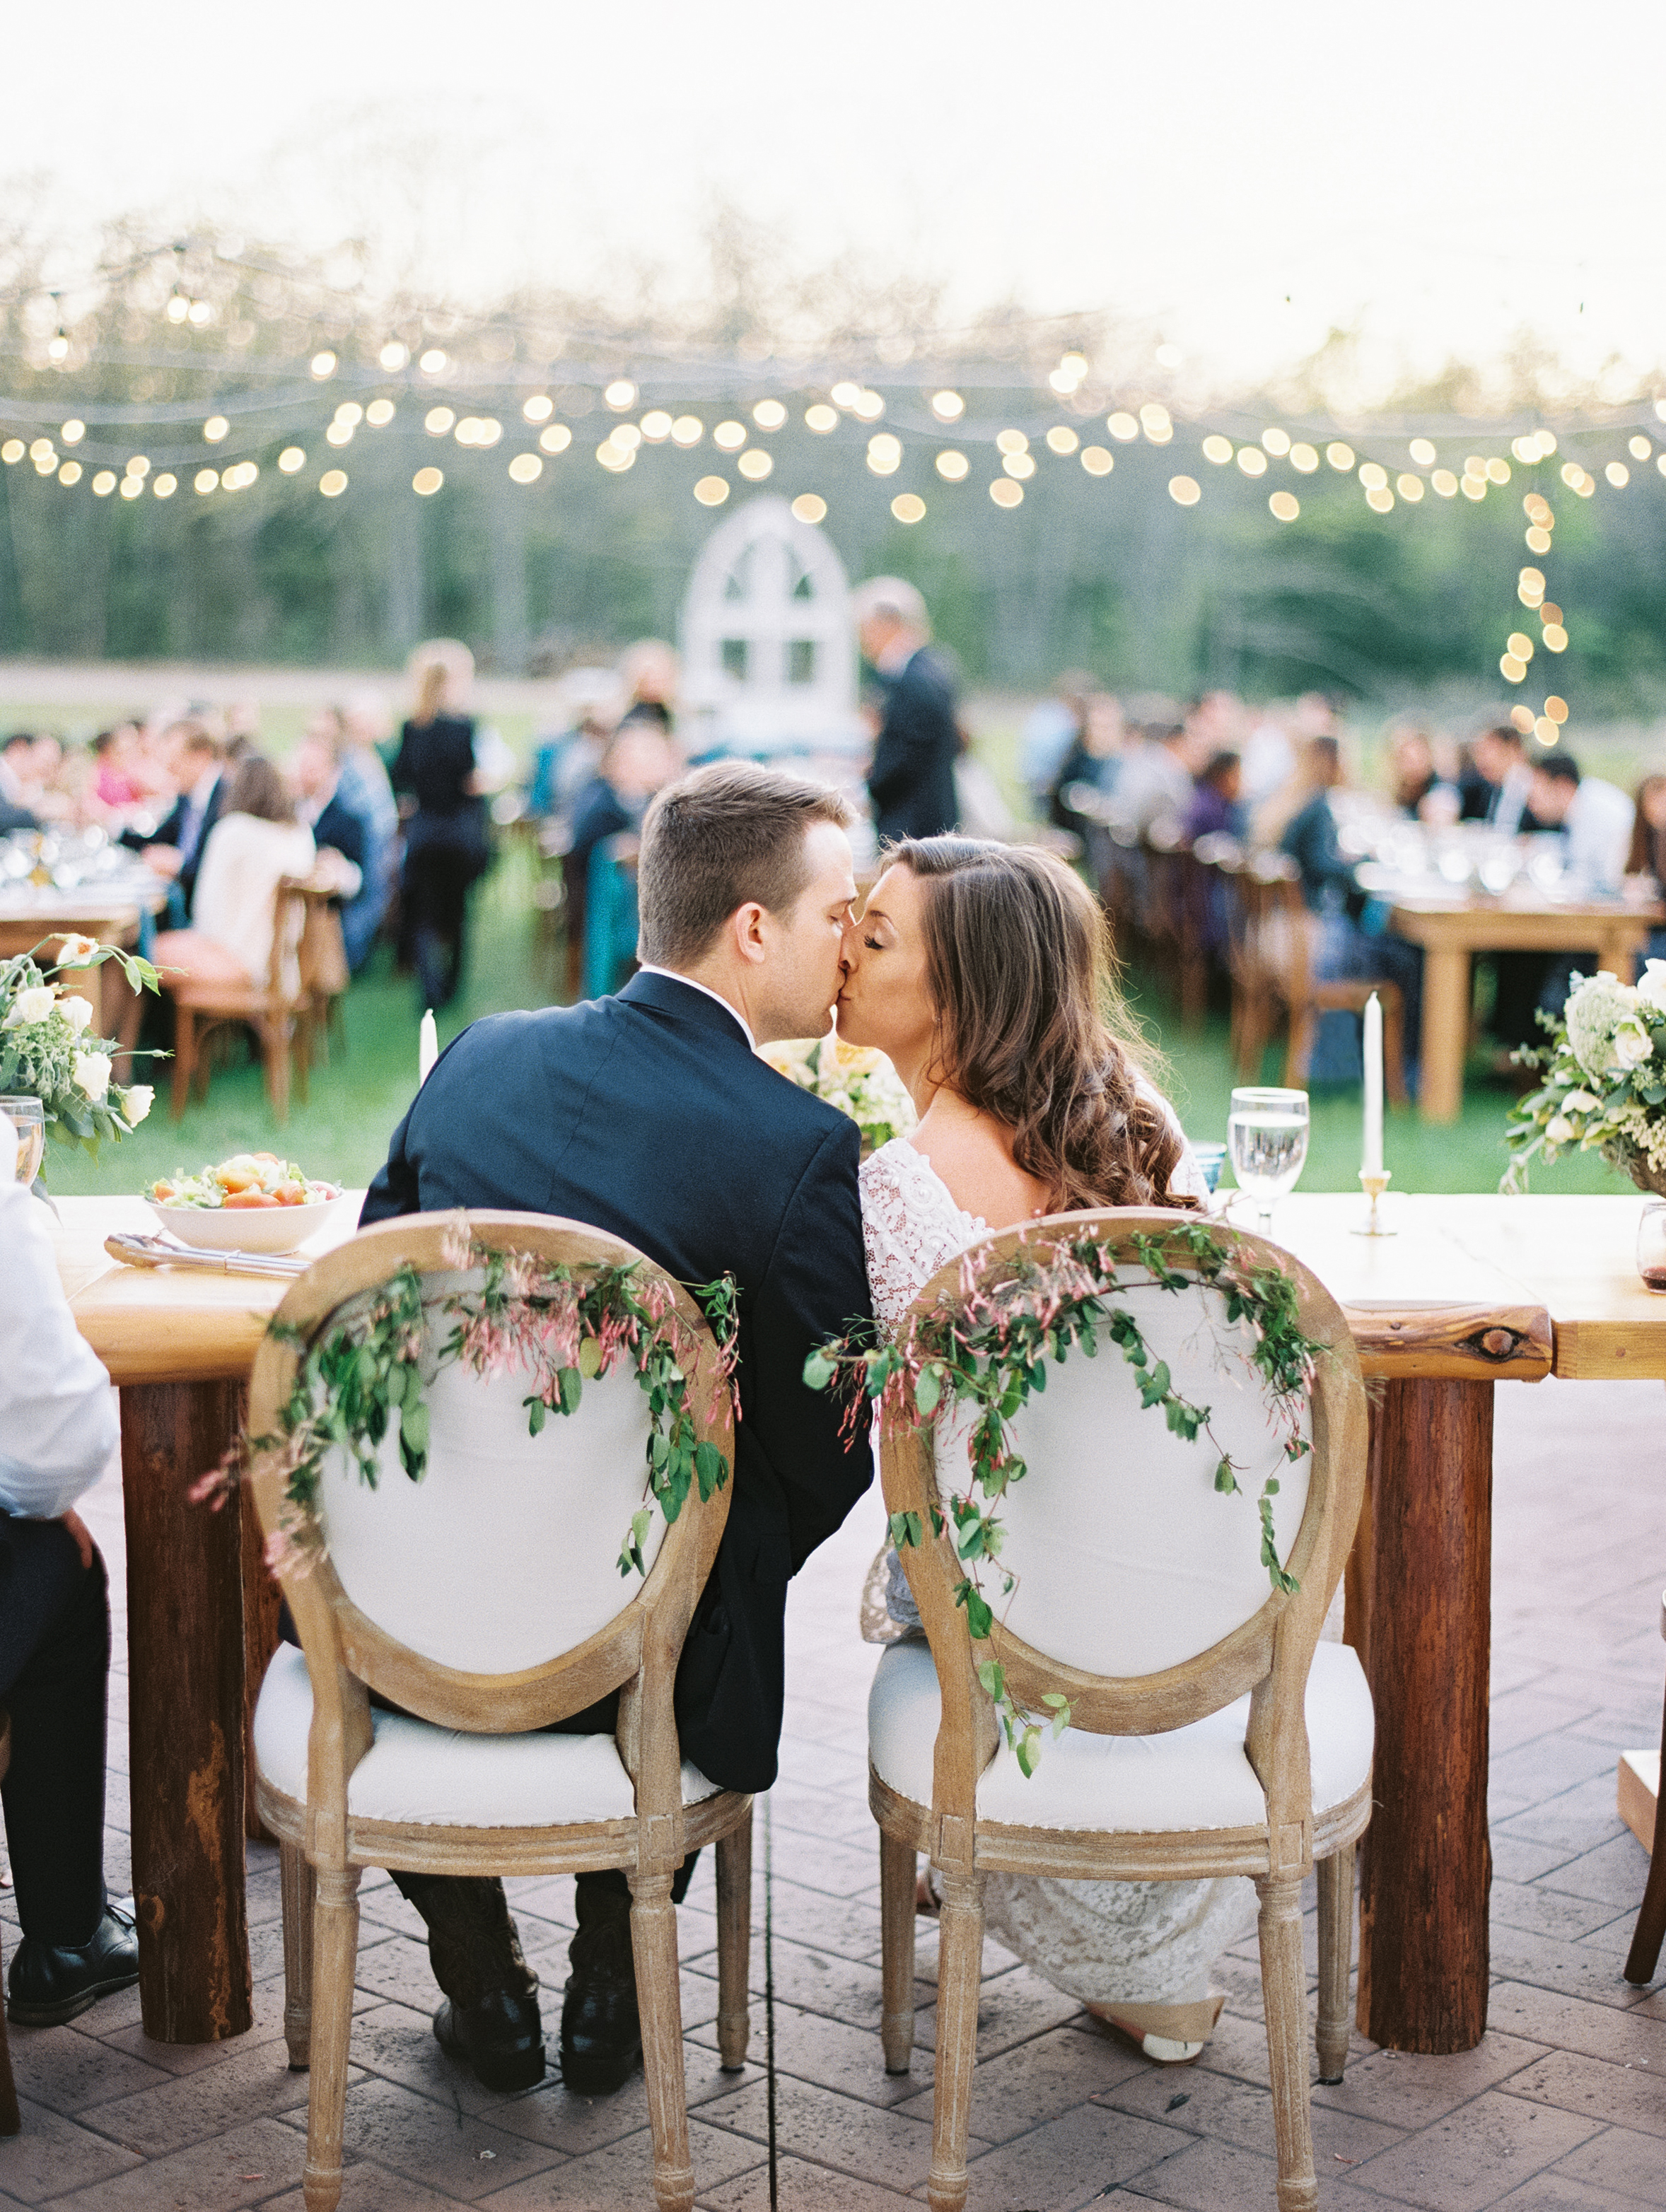 Callie & Chris: Outdoor Spring Wedding